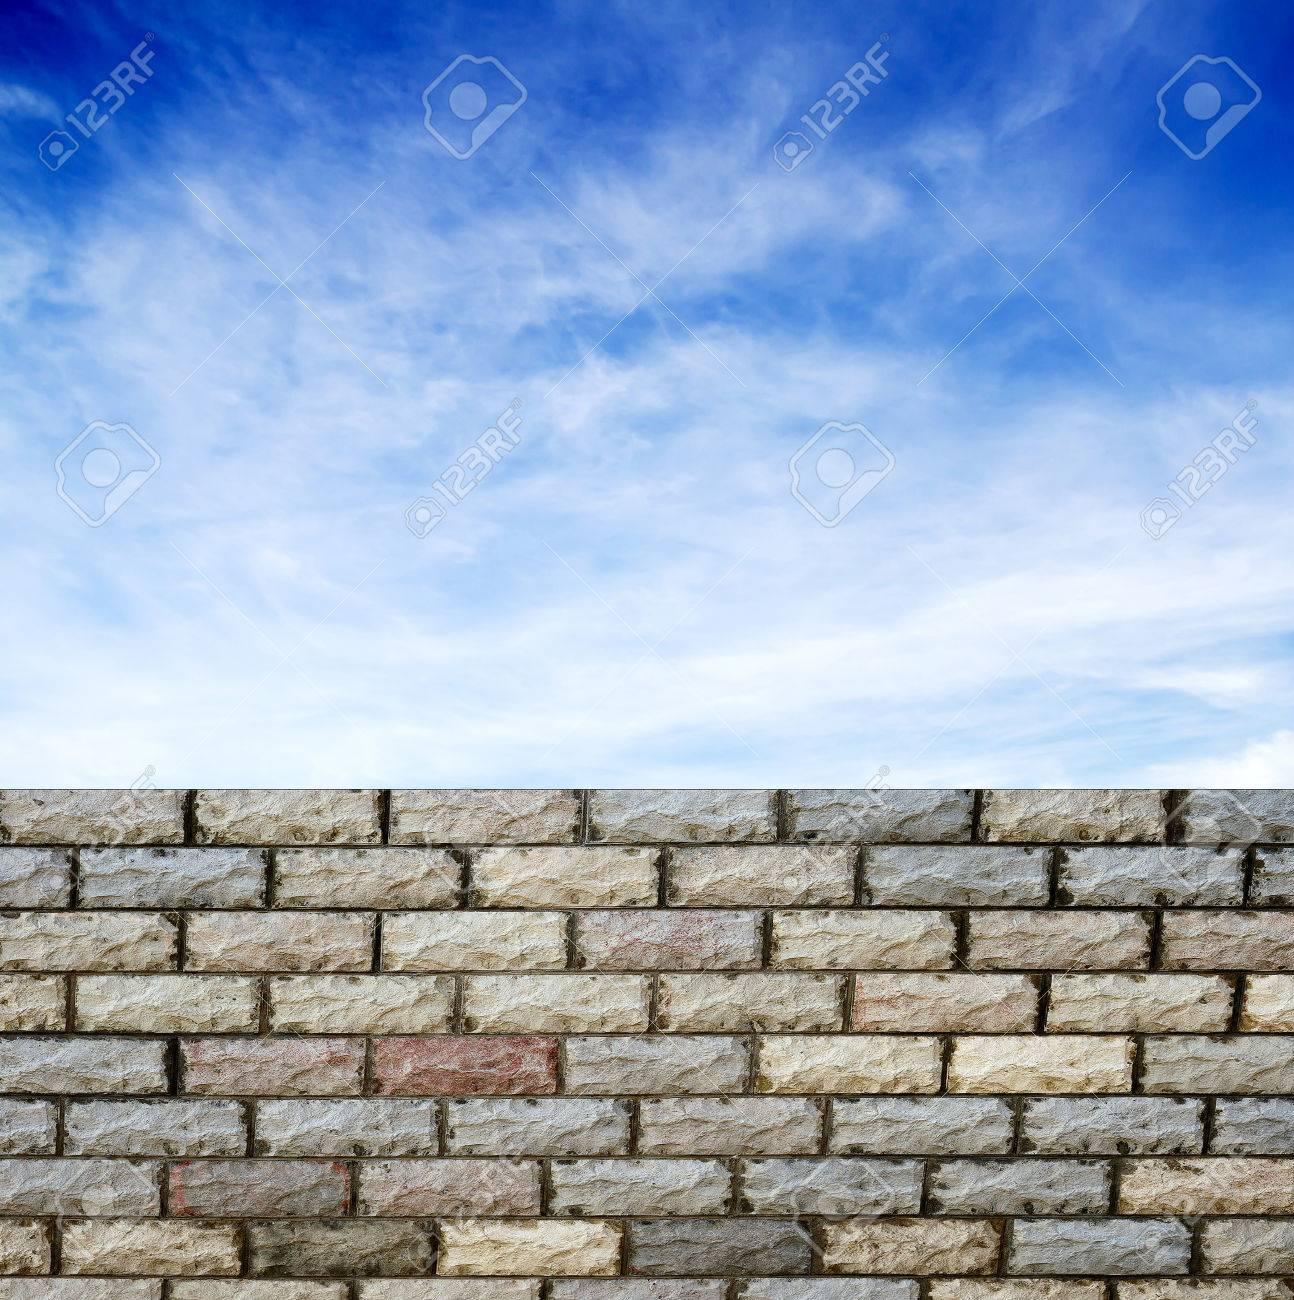 Dekorative Ziegelmauer Wand Gegen Blauen Himmel Standard Bild   27098241